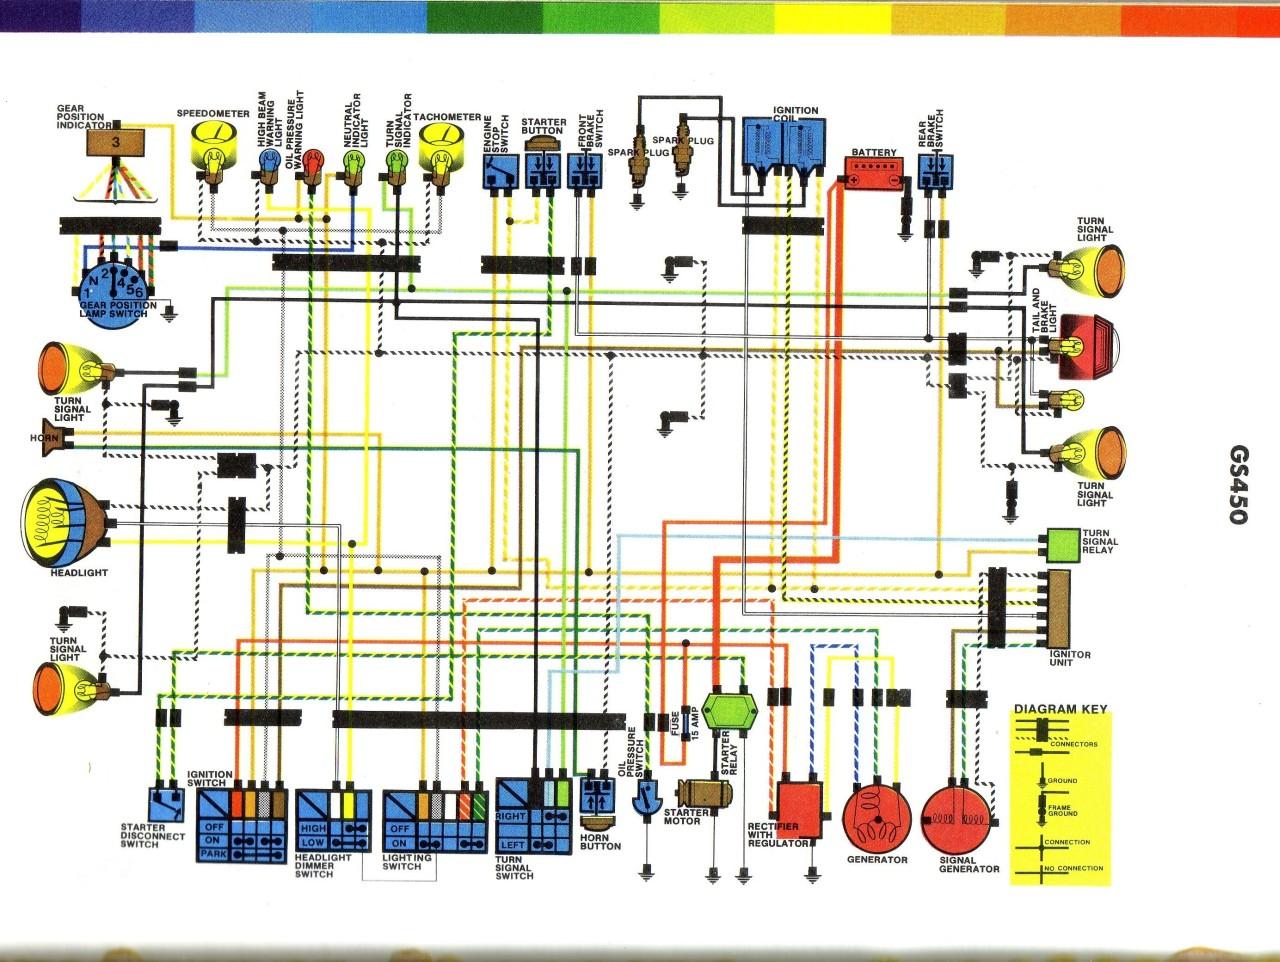 hight resolution of gs450 wiring diagram gs450lie gs550 wiring diagram gs450 wiring diagram